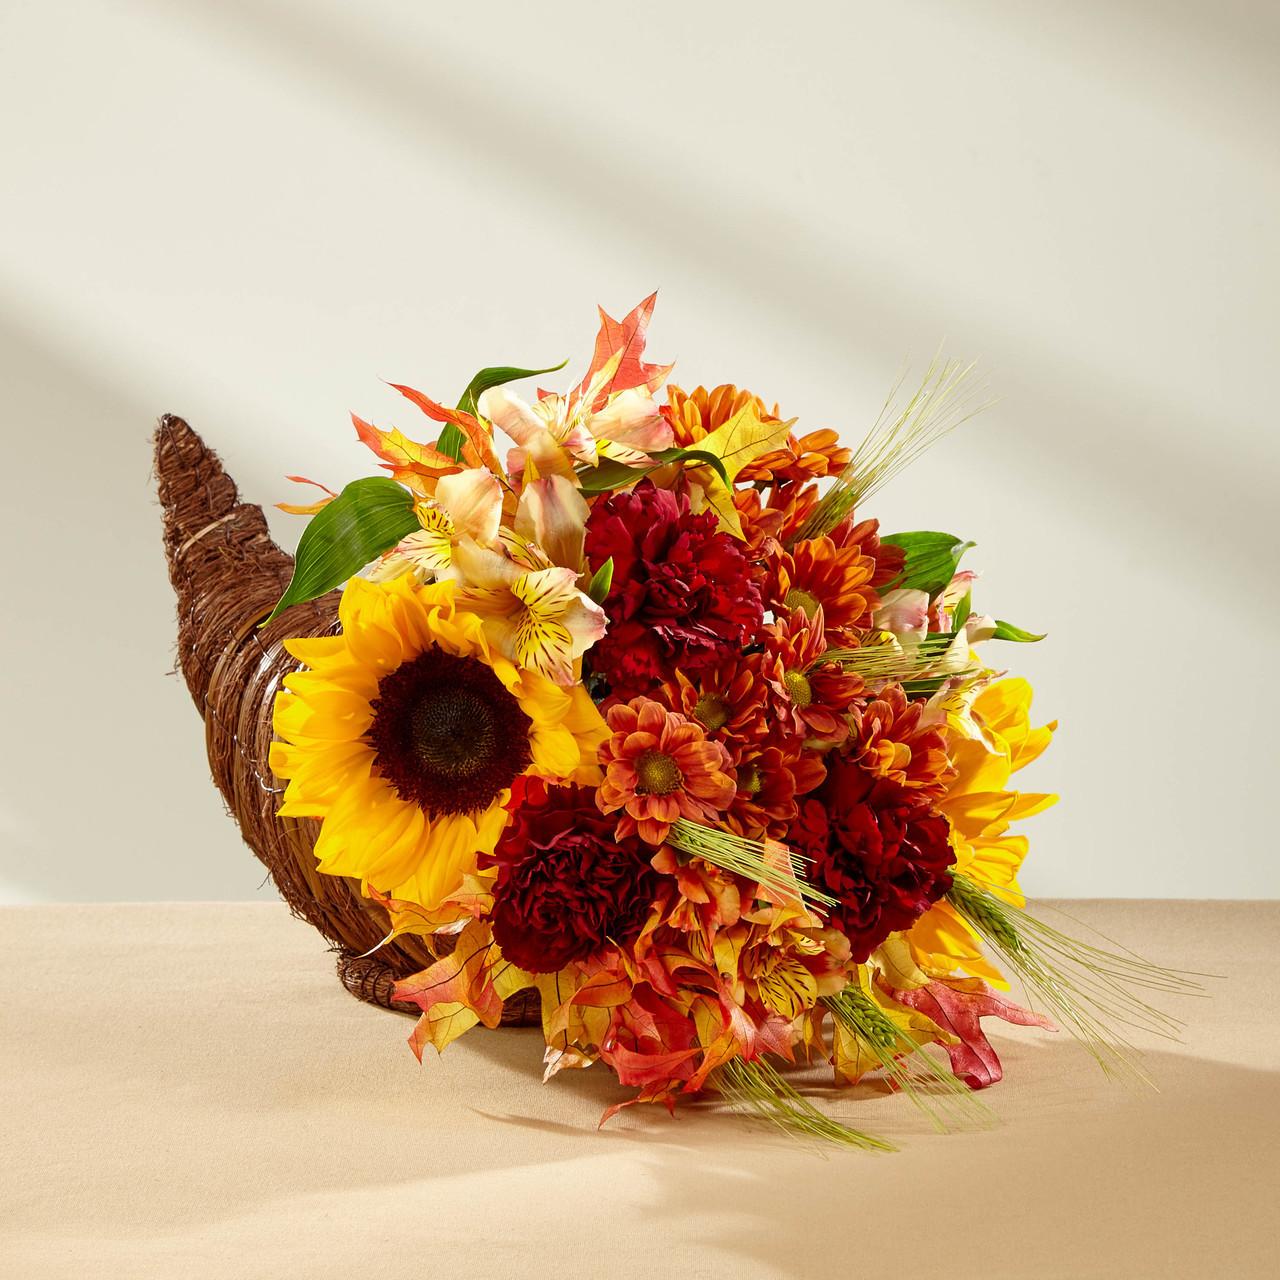 Fall Harvest Cornucopia by Soderberg's Floral & Gift